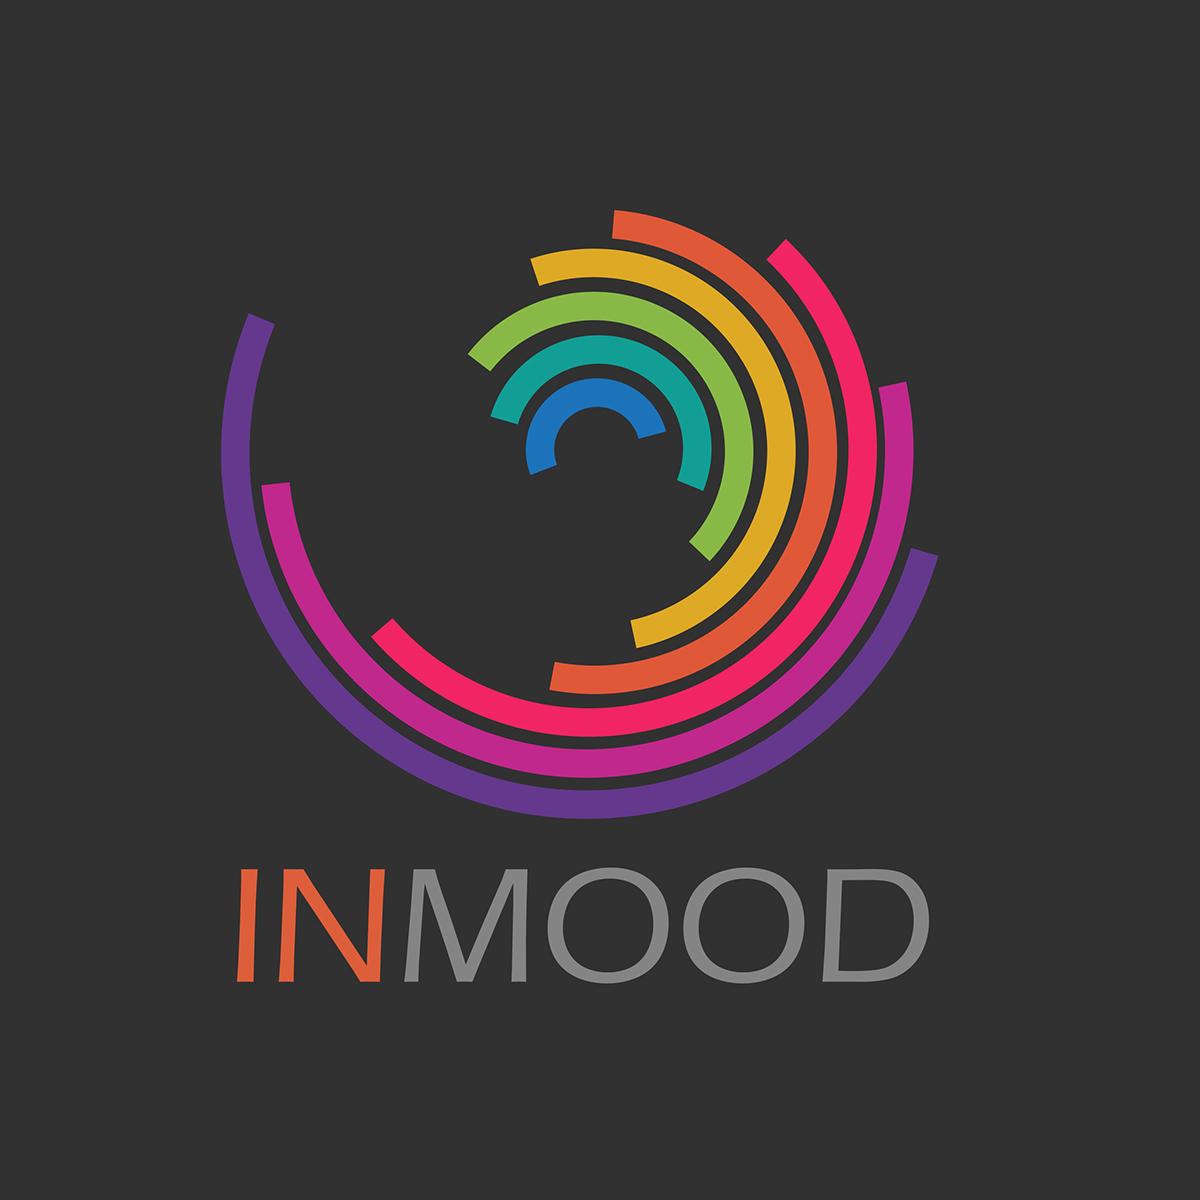 Inmood Creative Agency